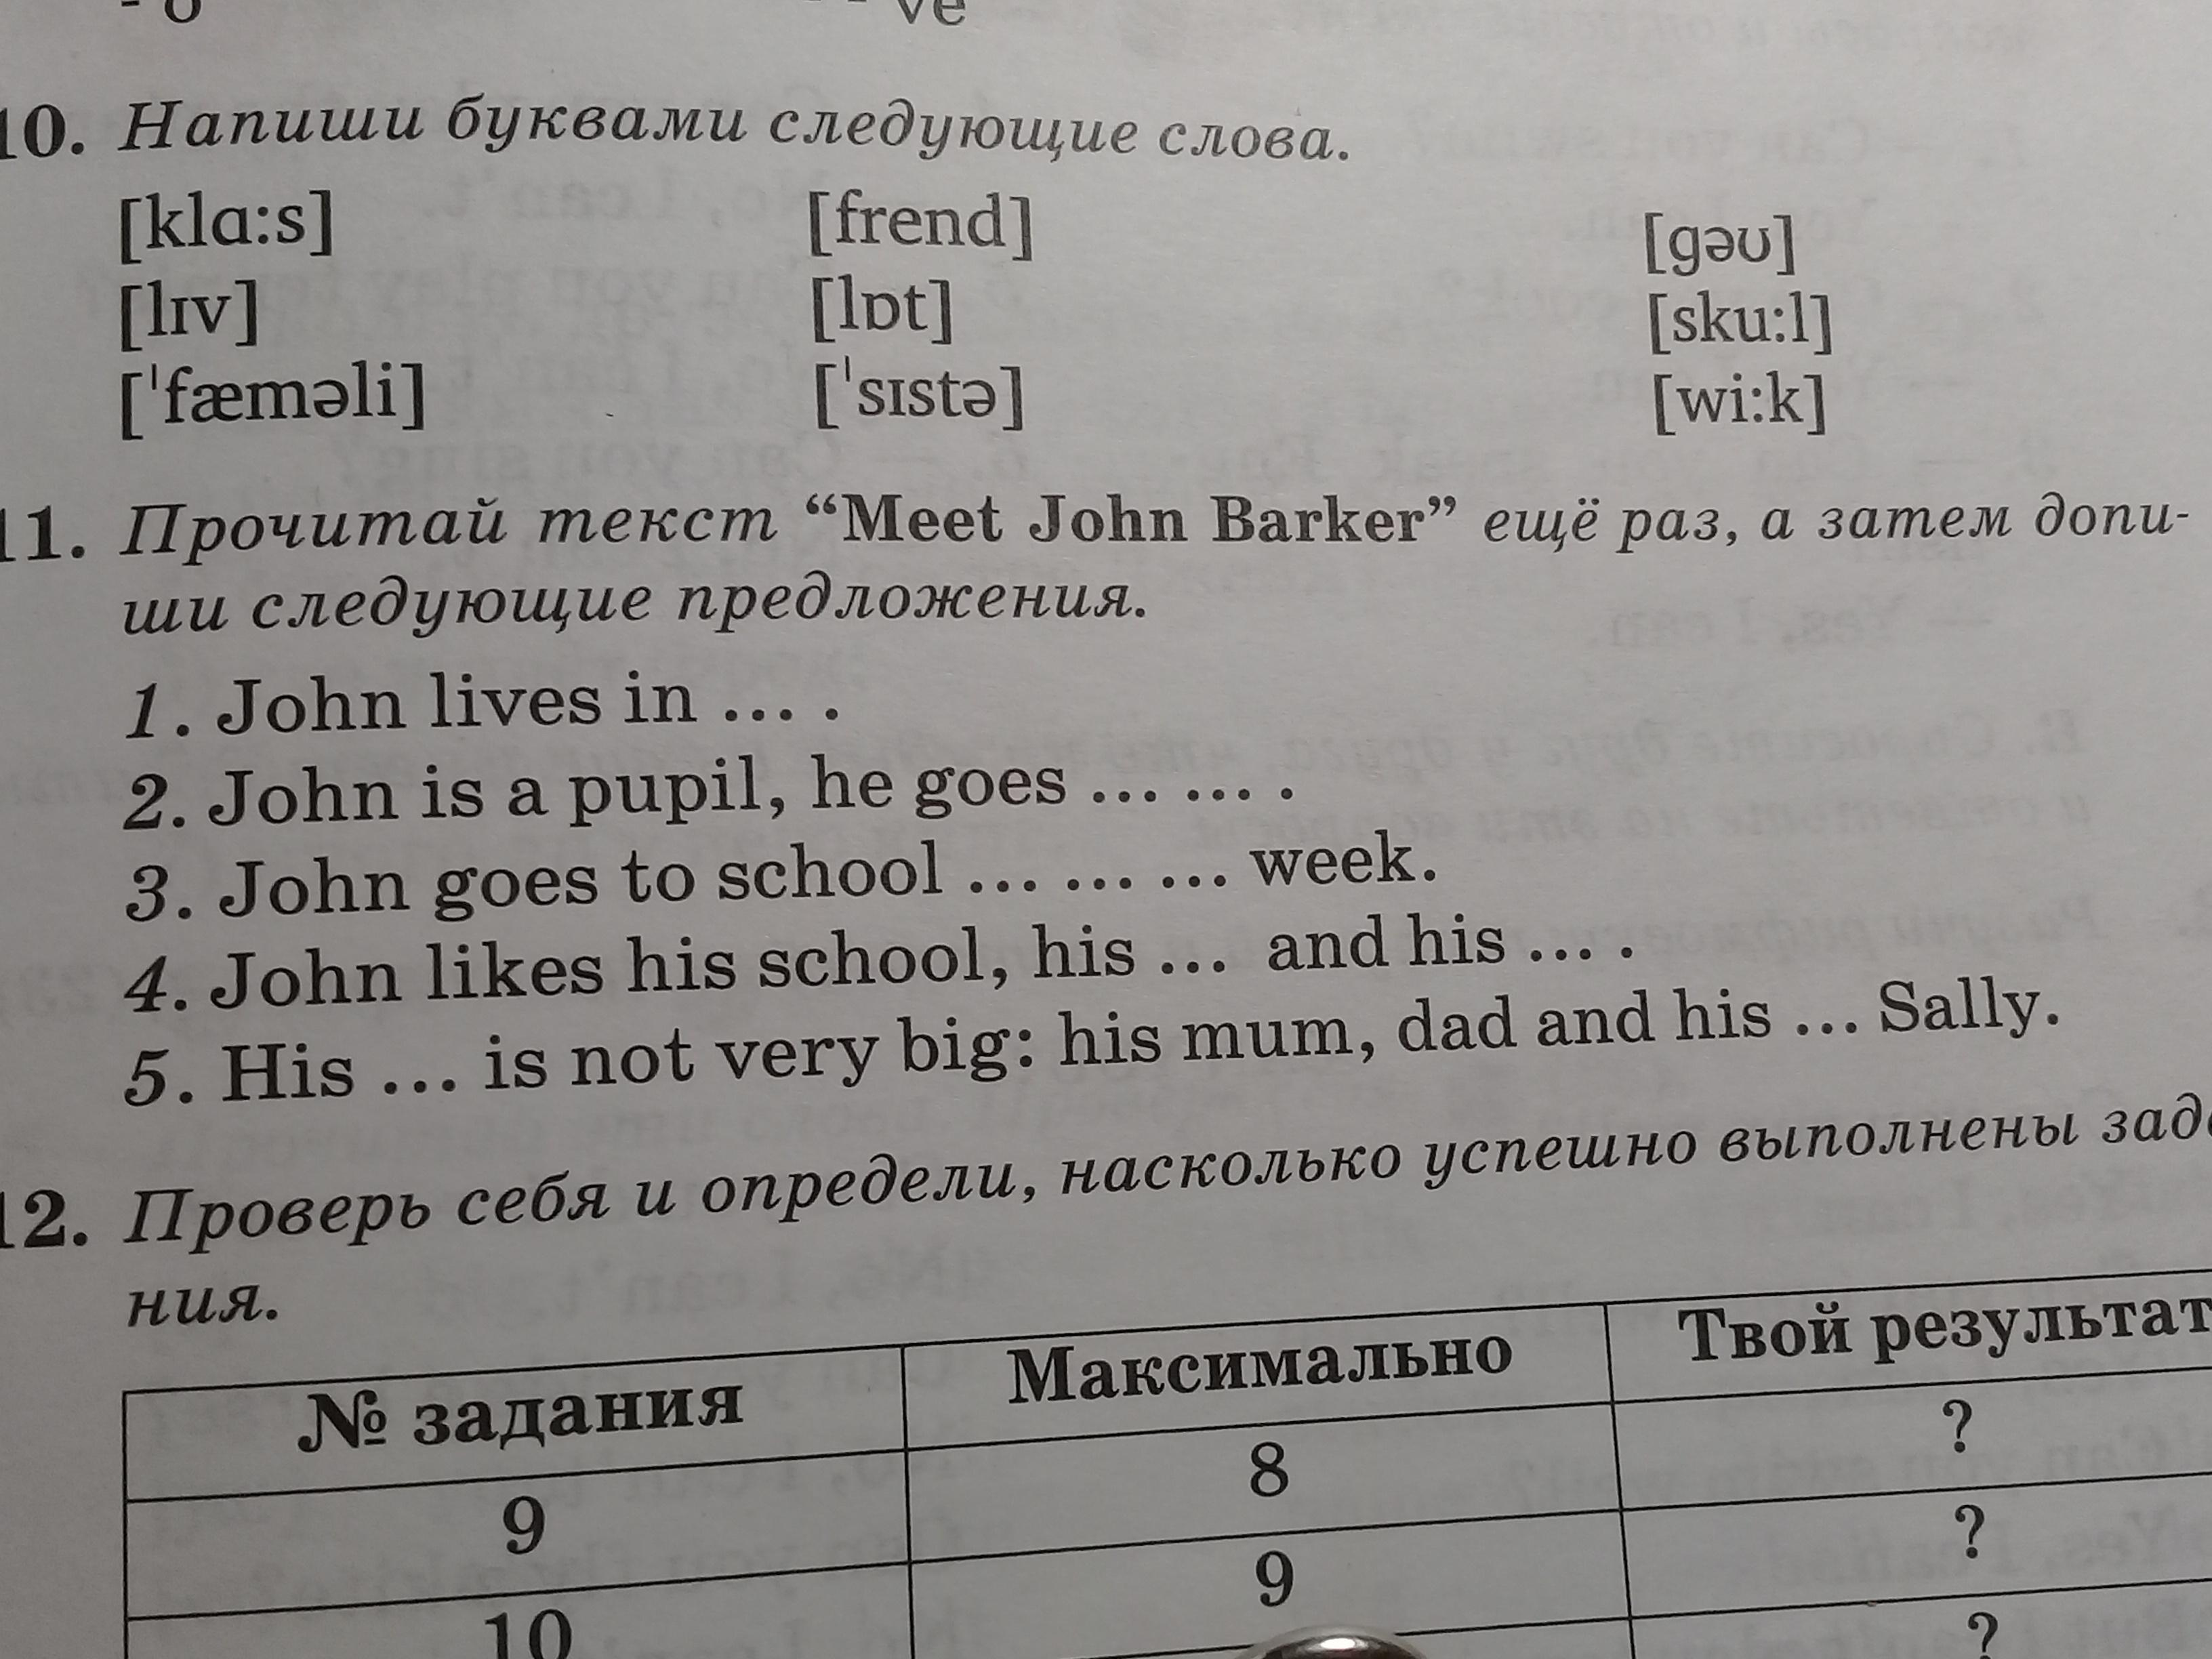 Meet john barker and his family контрольная работа 2855